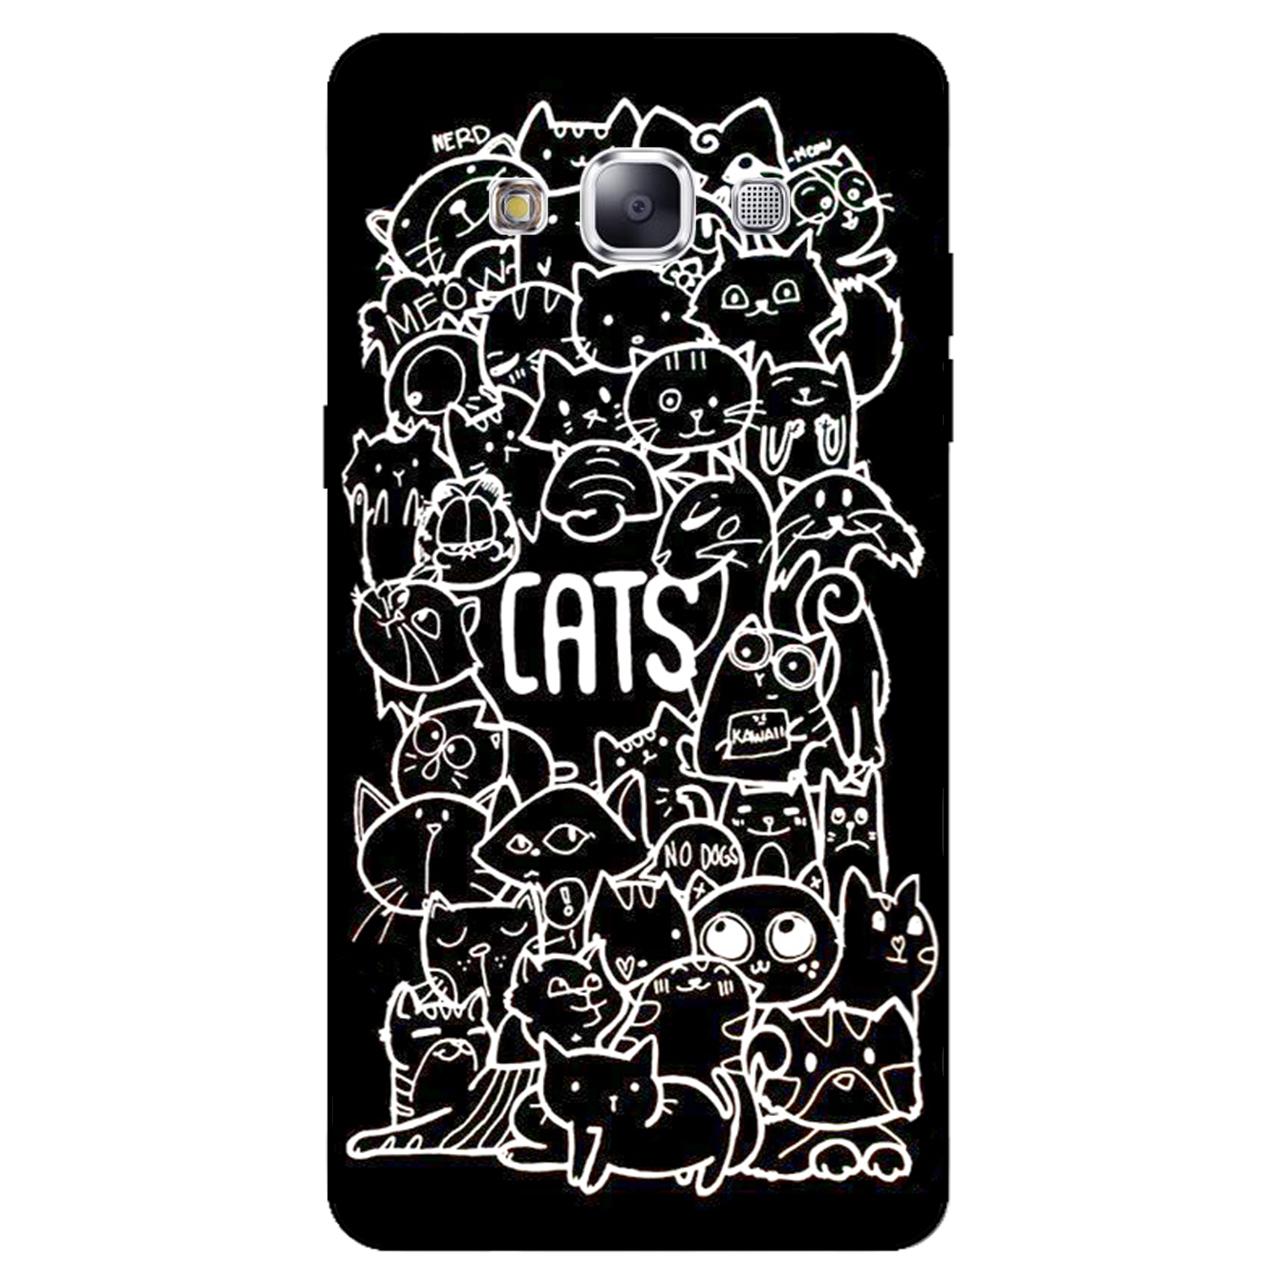 کاور کی اچ مدل 7226 مناسب برای گوشی موبایل سامسونگ Galaxy A5 2015